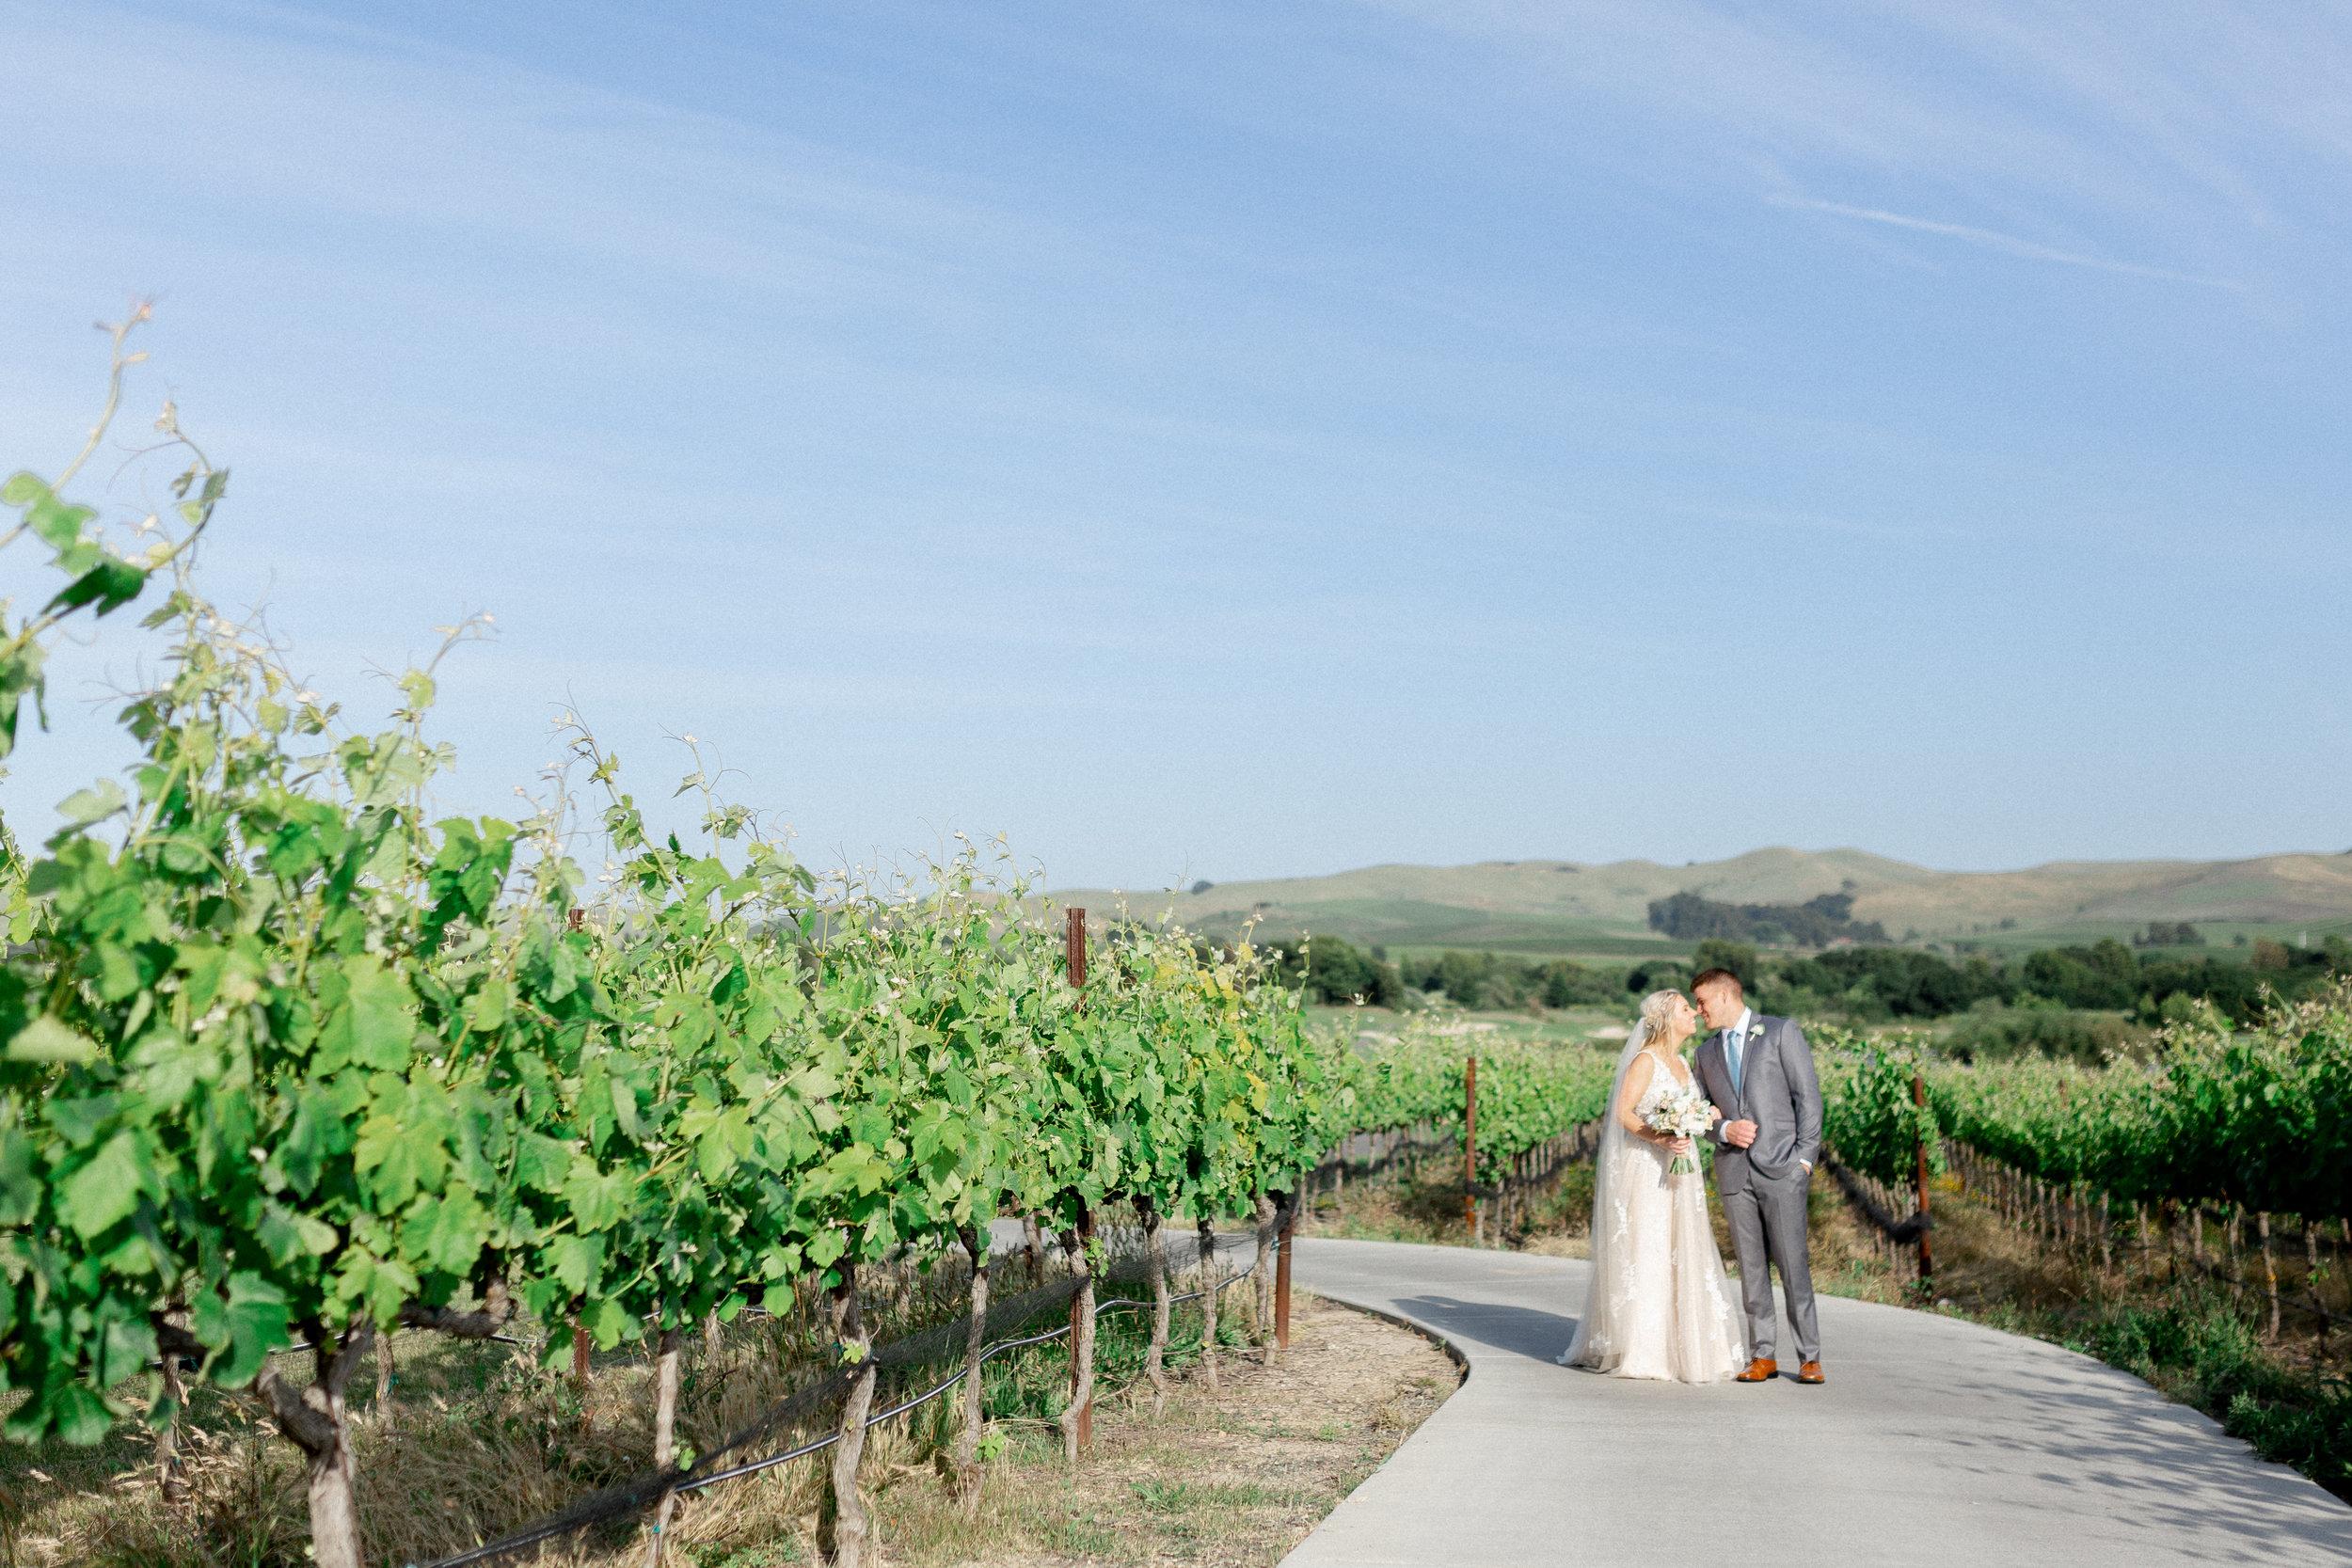 Eagle-Vines-Golf-Course-wedding-photographer (138 of 206).jpg